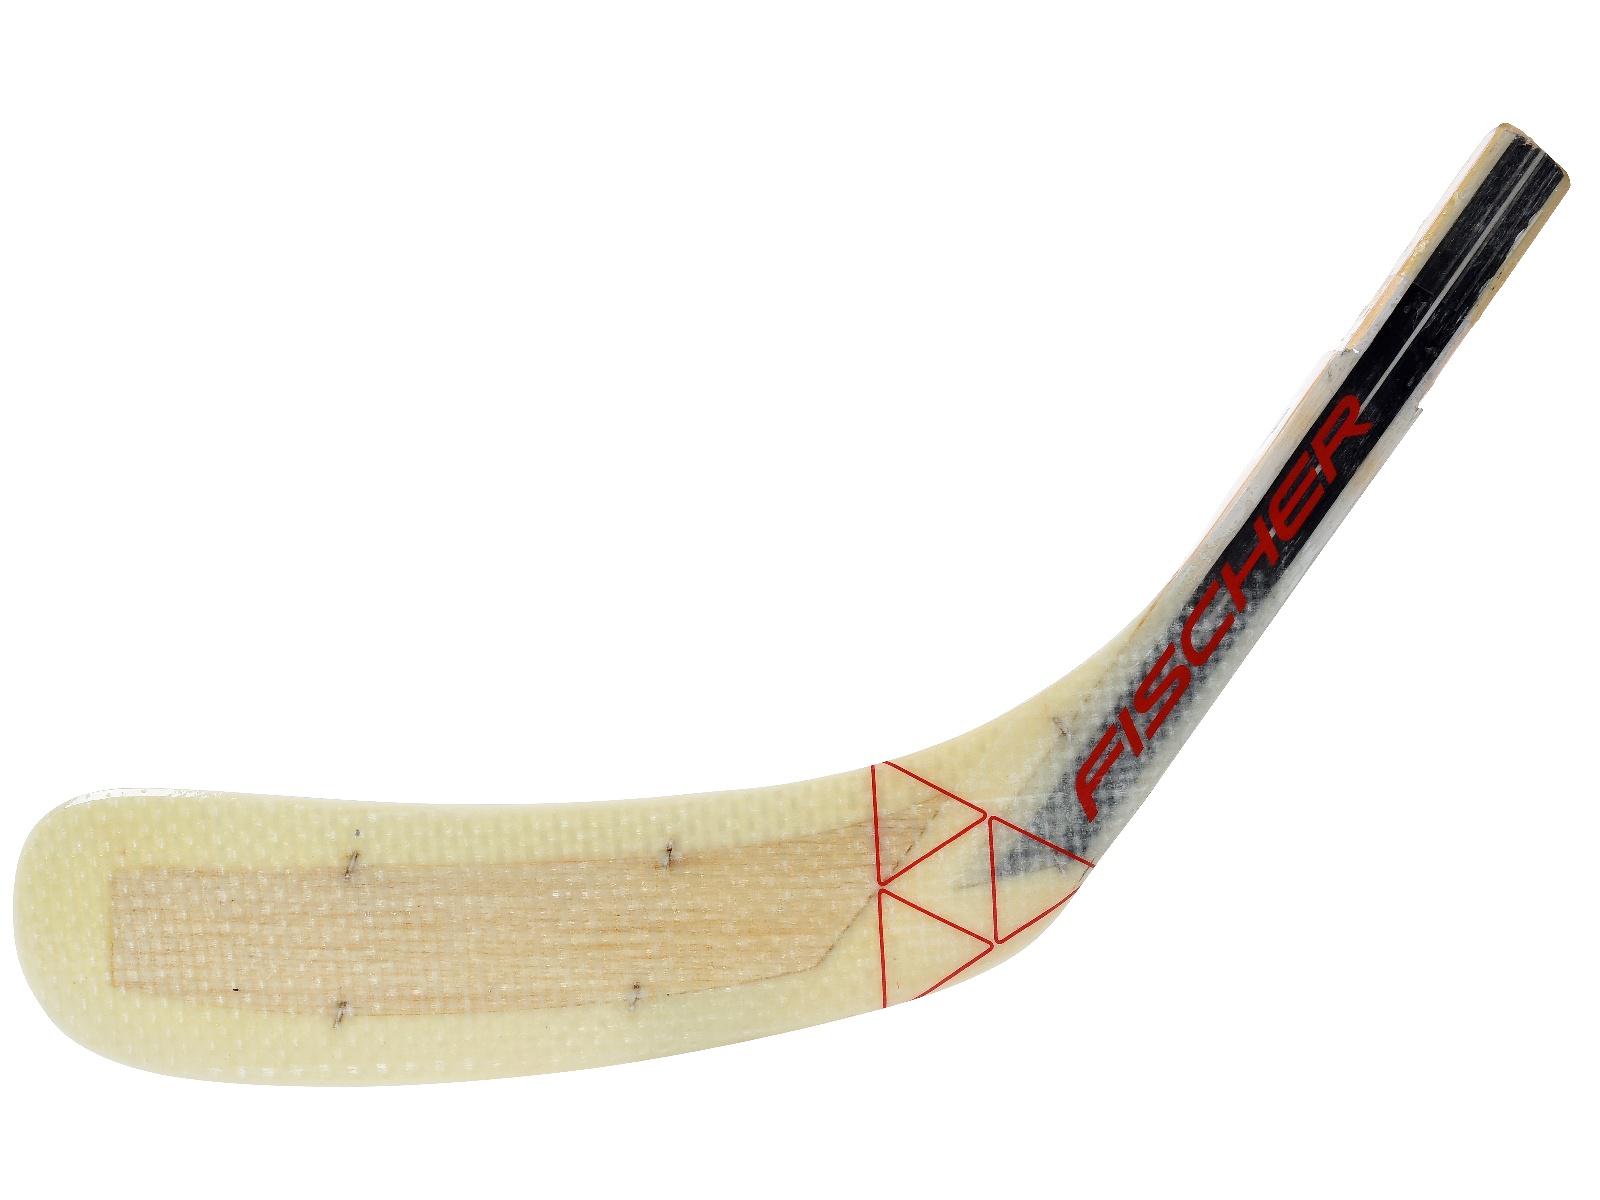 Hokejová čepel FISCHER W350 Senior - RH 92